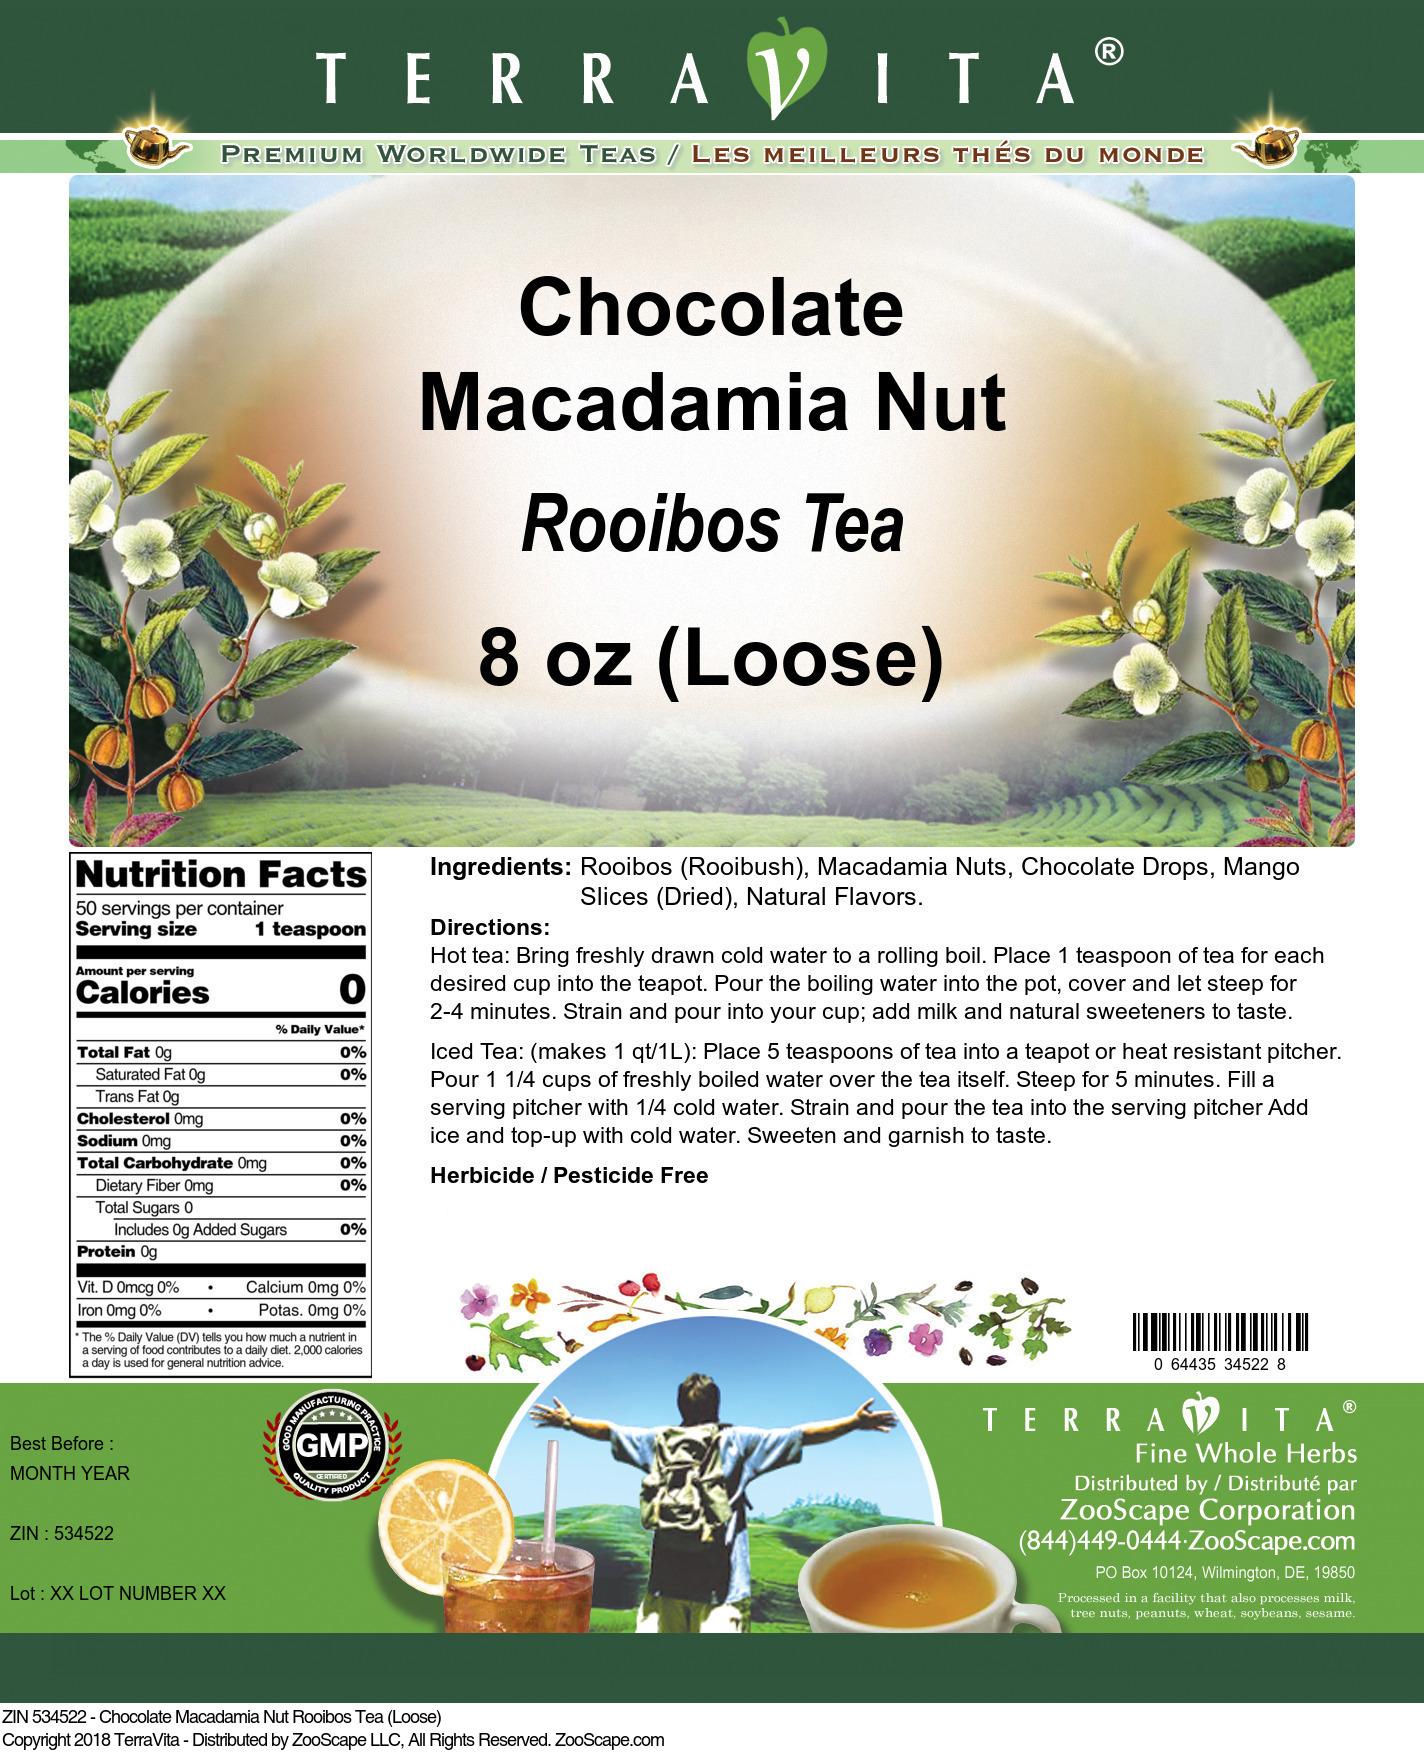 Chocolate Macadamia Nut Rooibos Tea